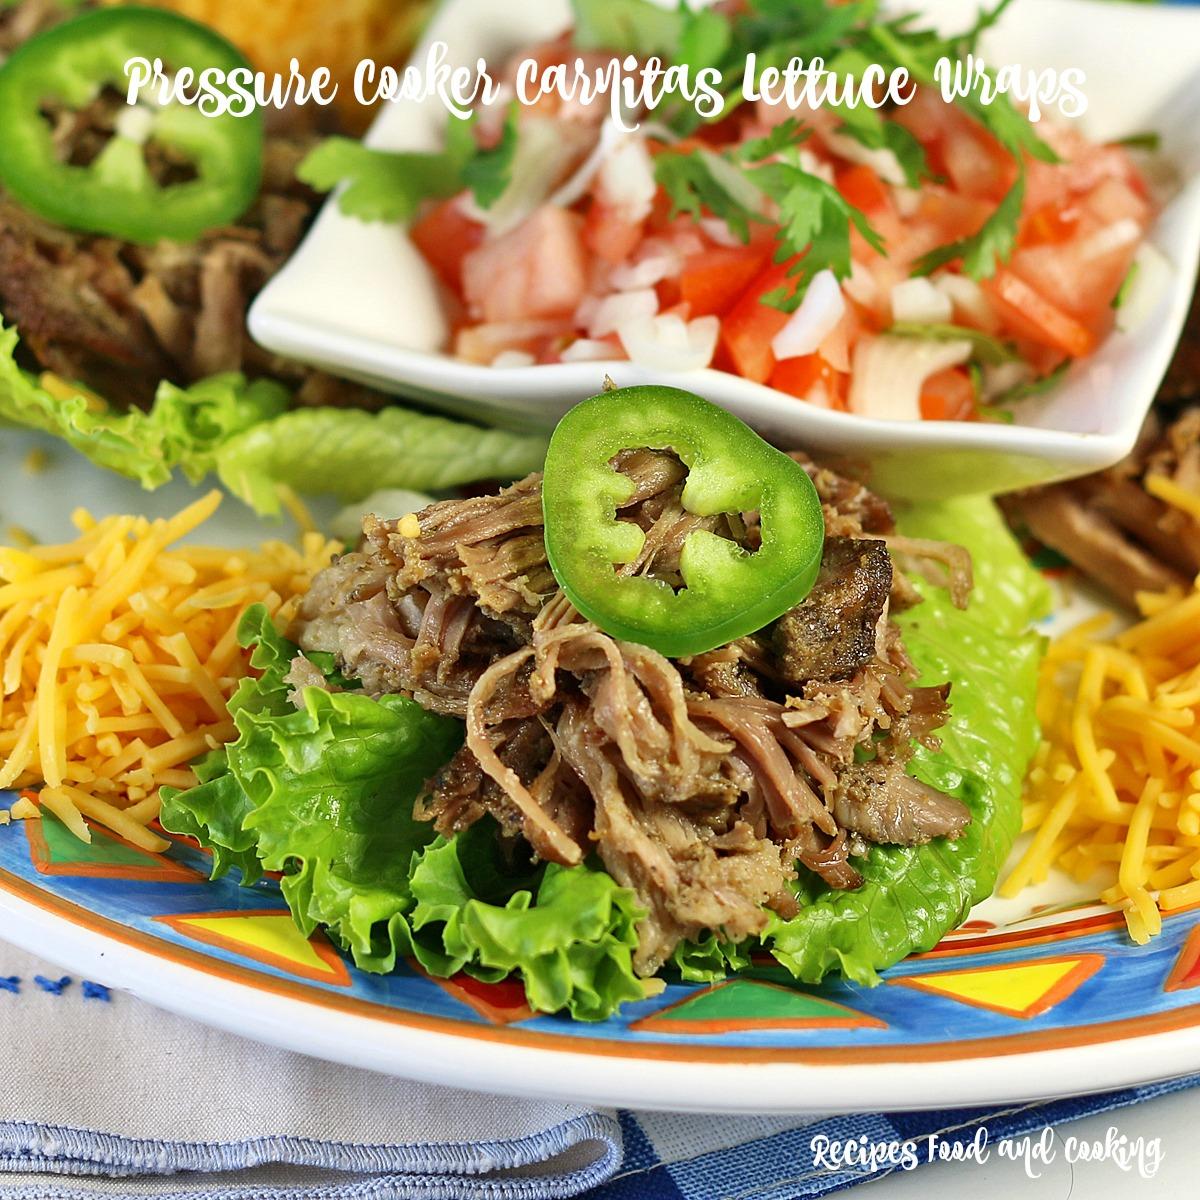 Pressure Cooker Carnitas Lettuce Wraps